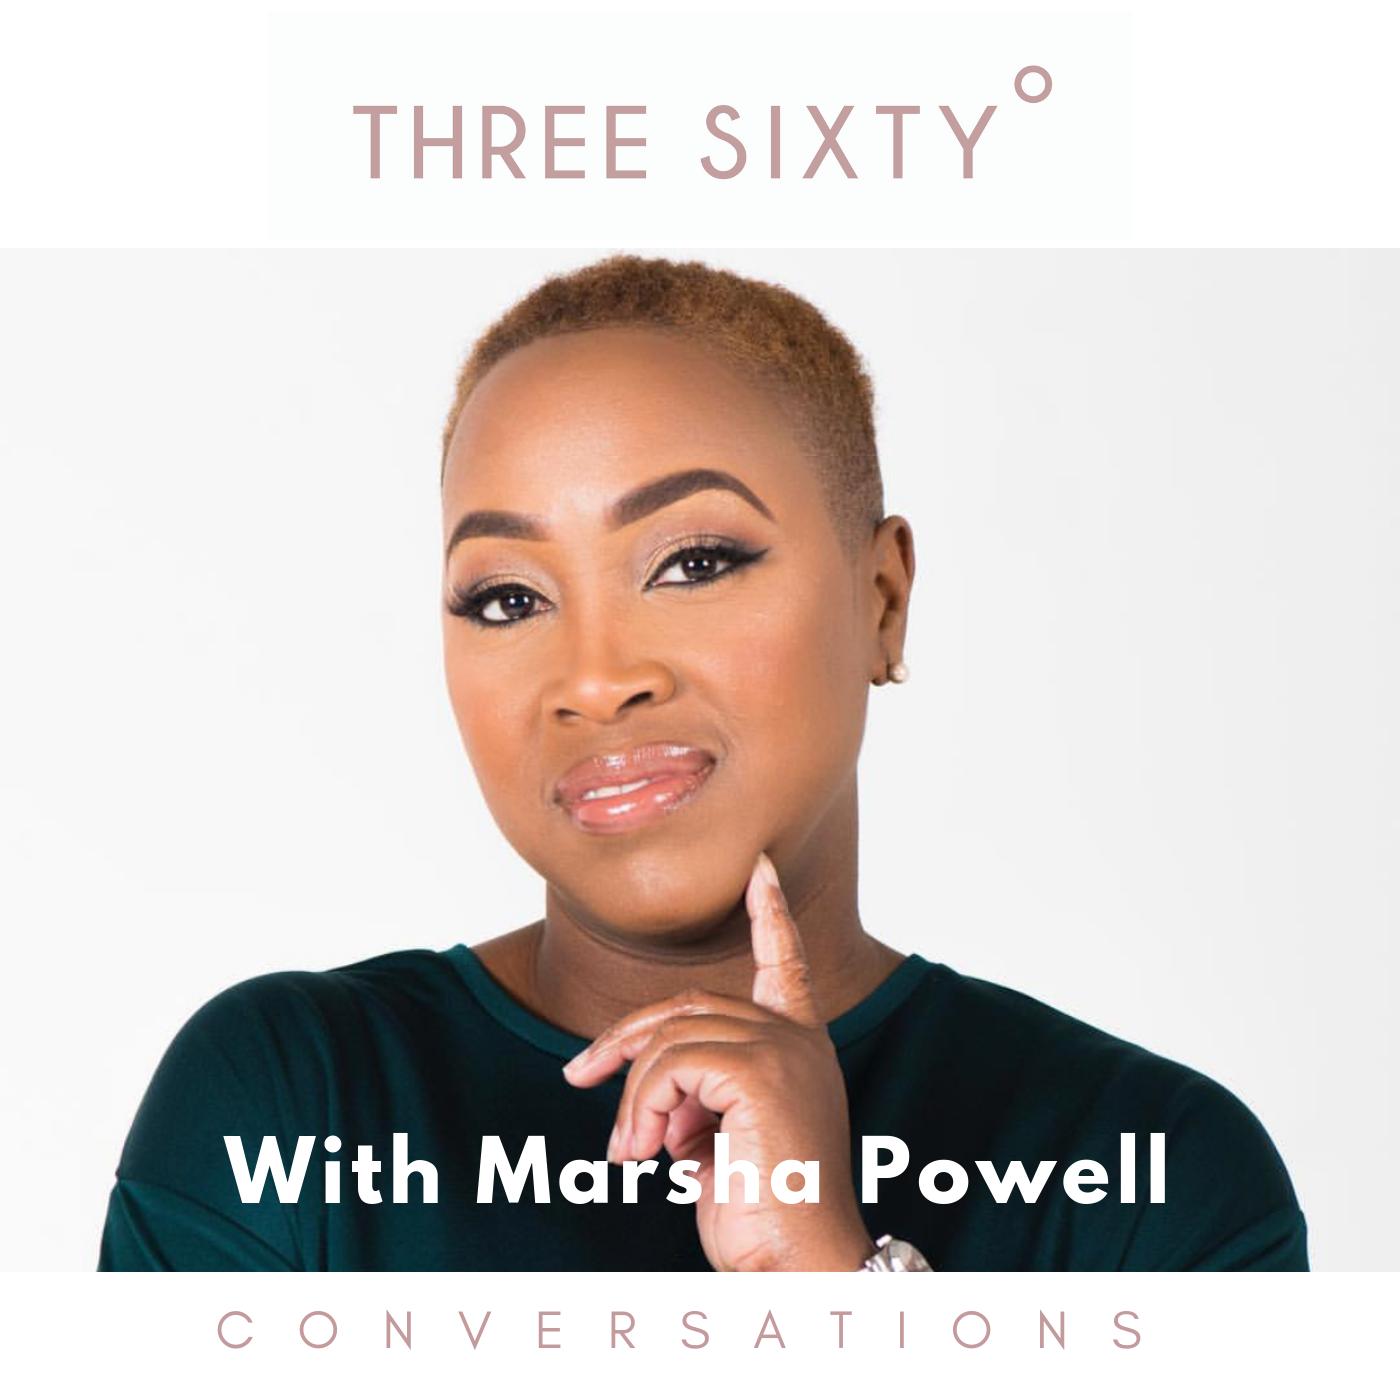 Marsha Powell, Eve and Grace, women of colour wellness, wellness studio, boutique wellness, representation matters, tamu Thomas. live three sixty, female founder